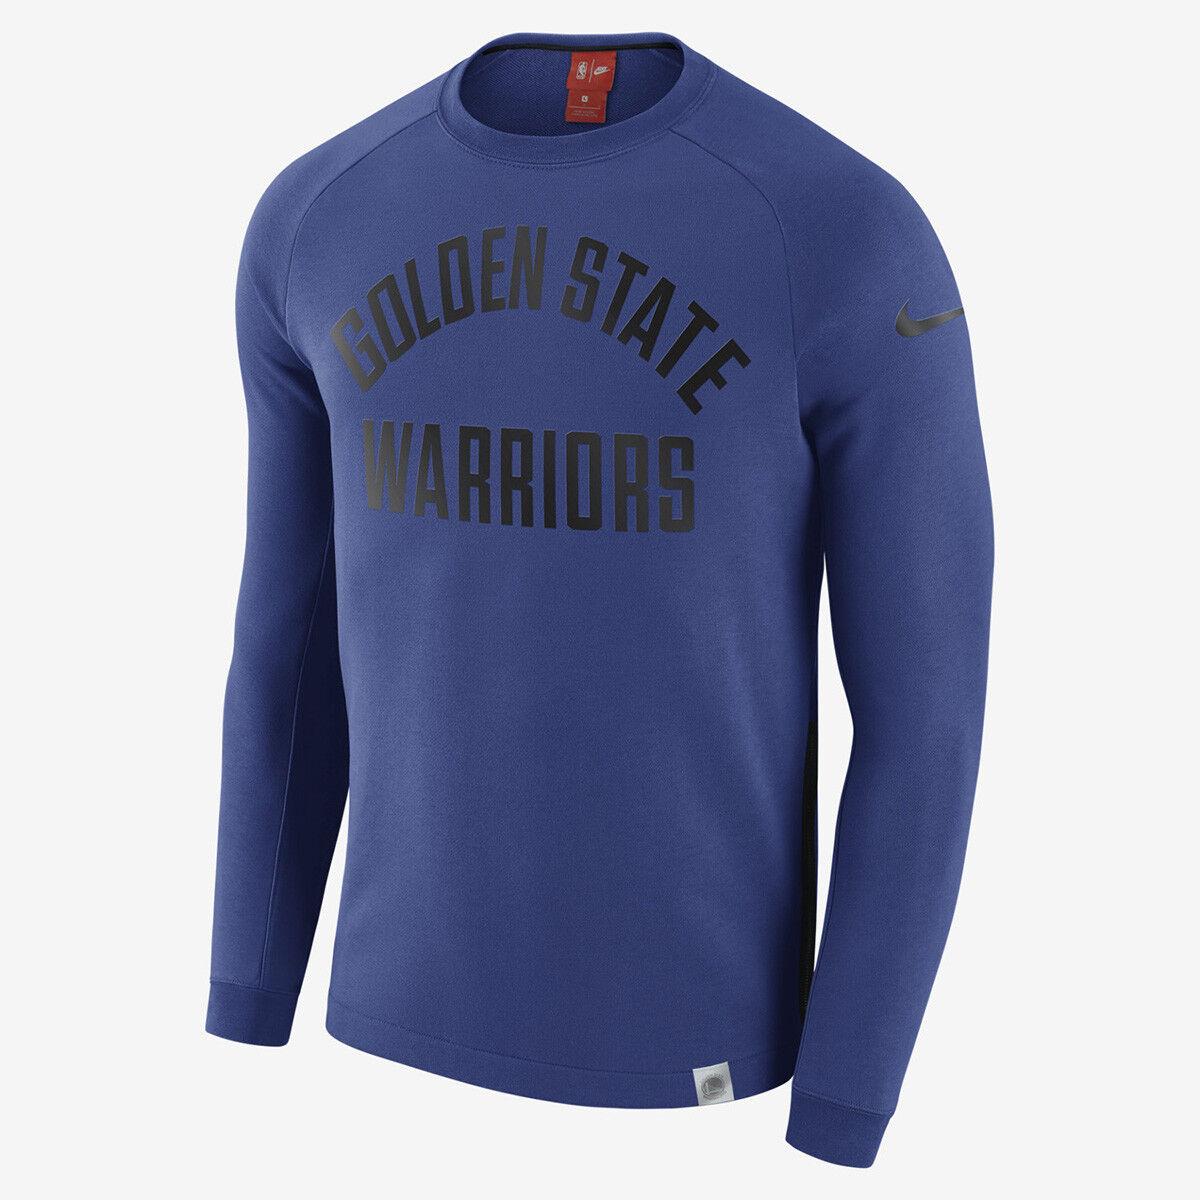 Nike NBA Golden State Warriors Moderne Langärmlig Rundhalsausschnitt Blau